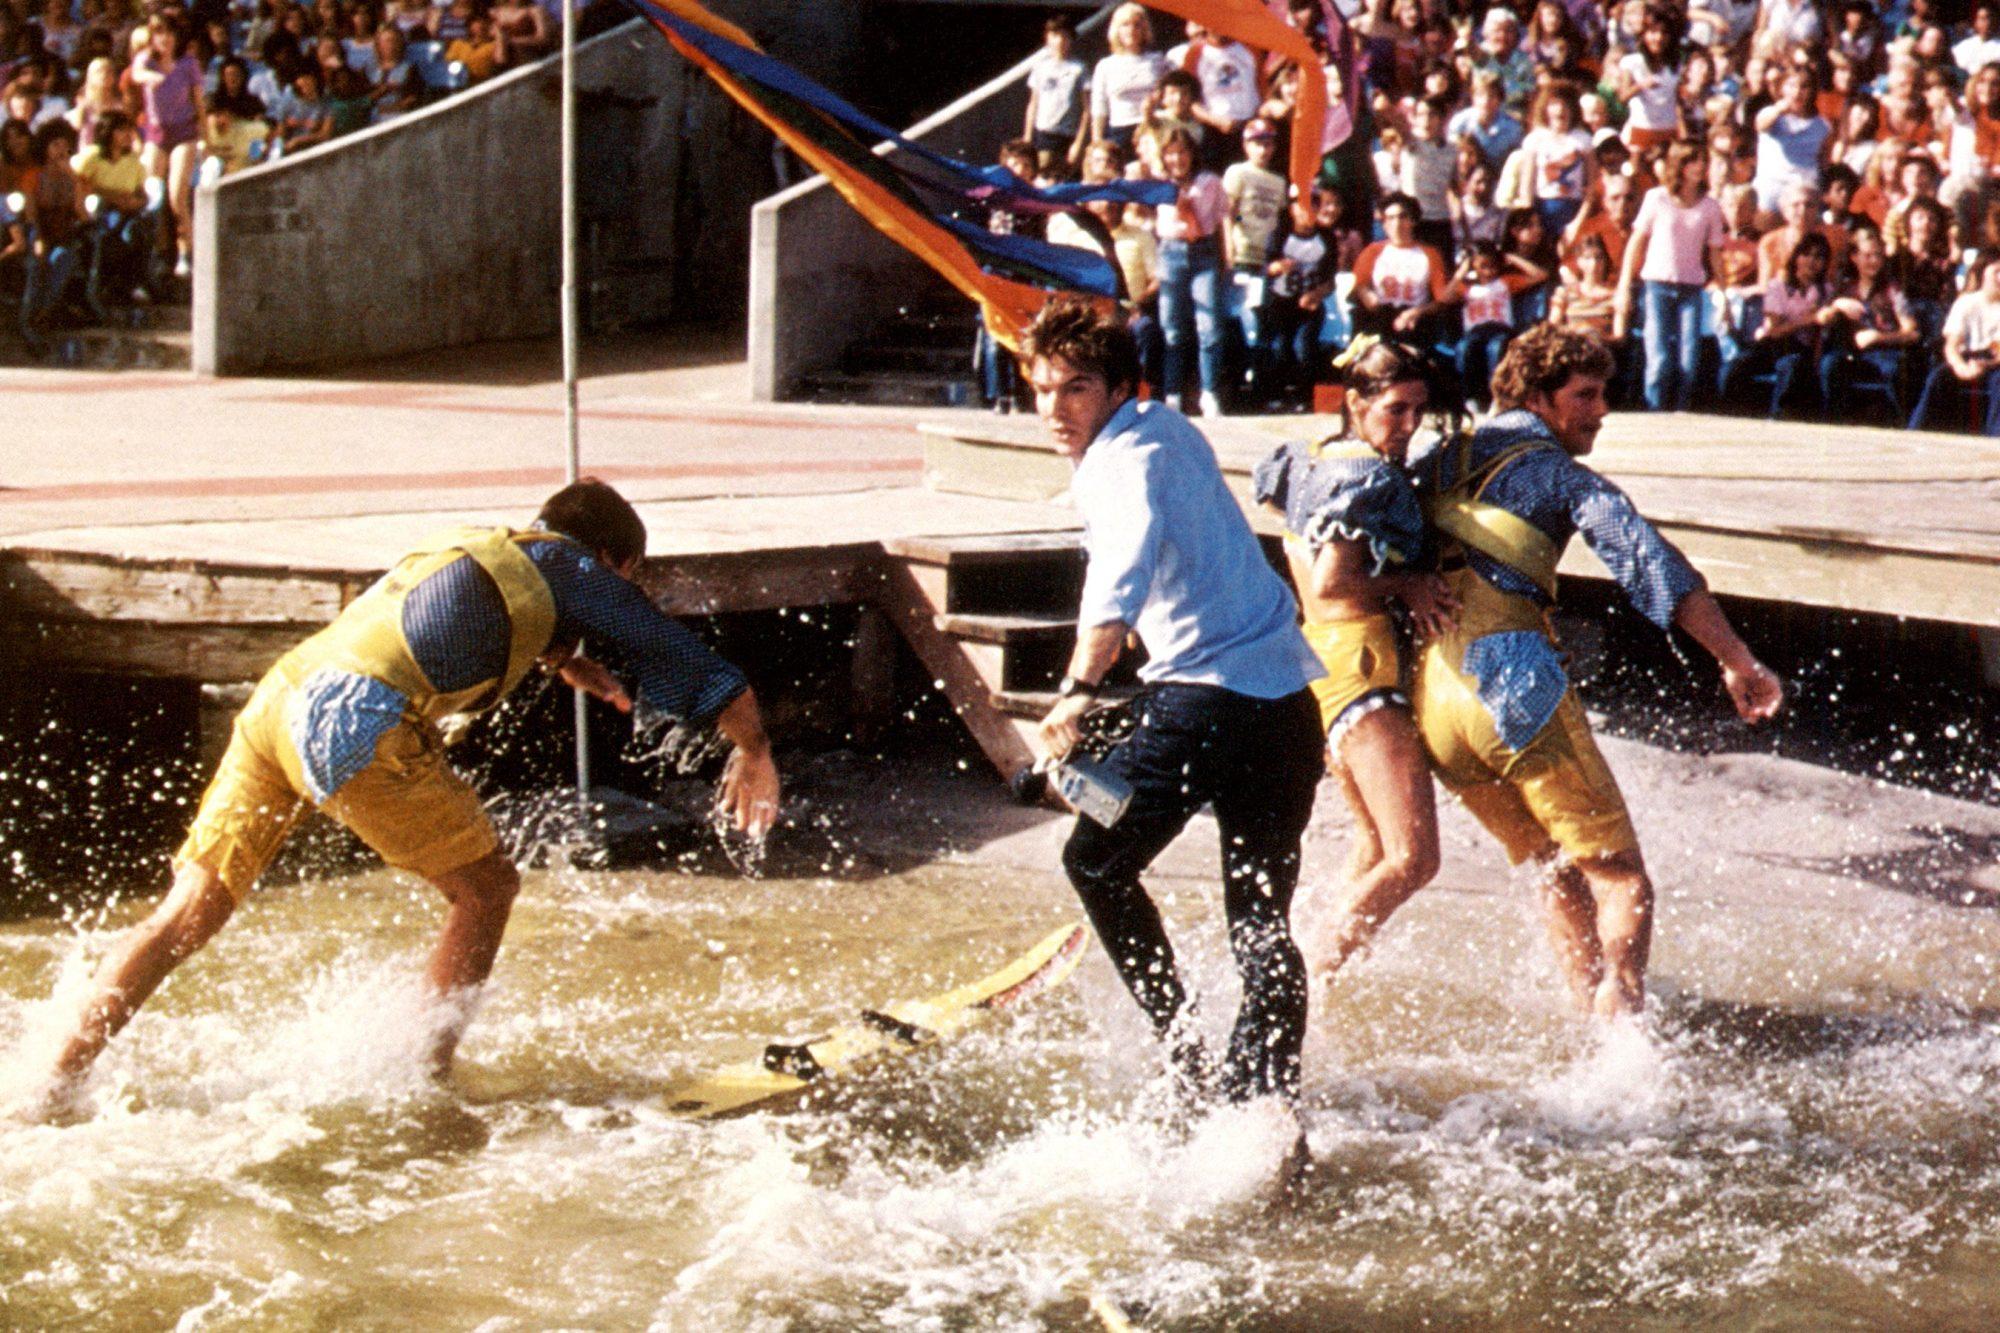 JAWS 3-D, Dennis Quaid (center), 1983, (c)Universal/courtesy Everett Collection